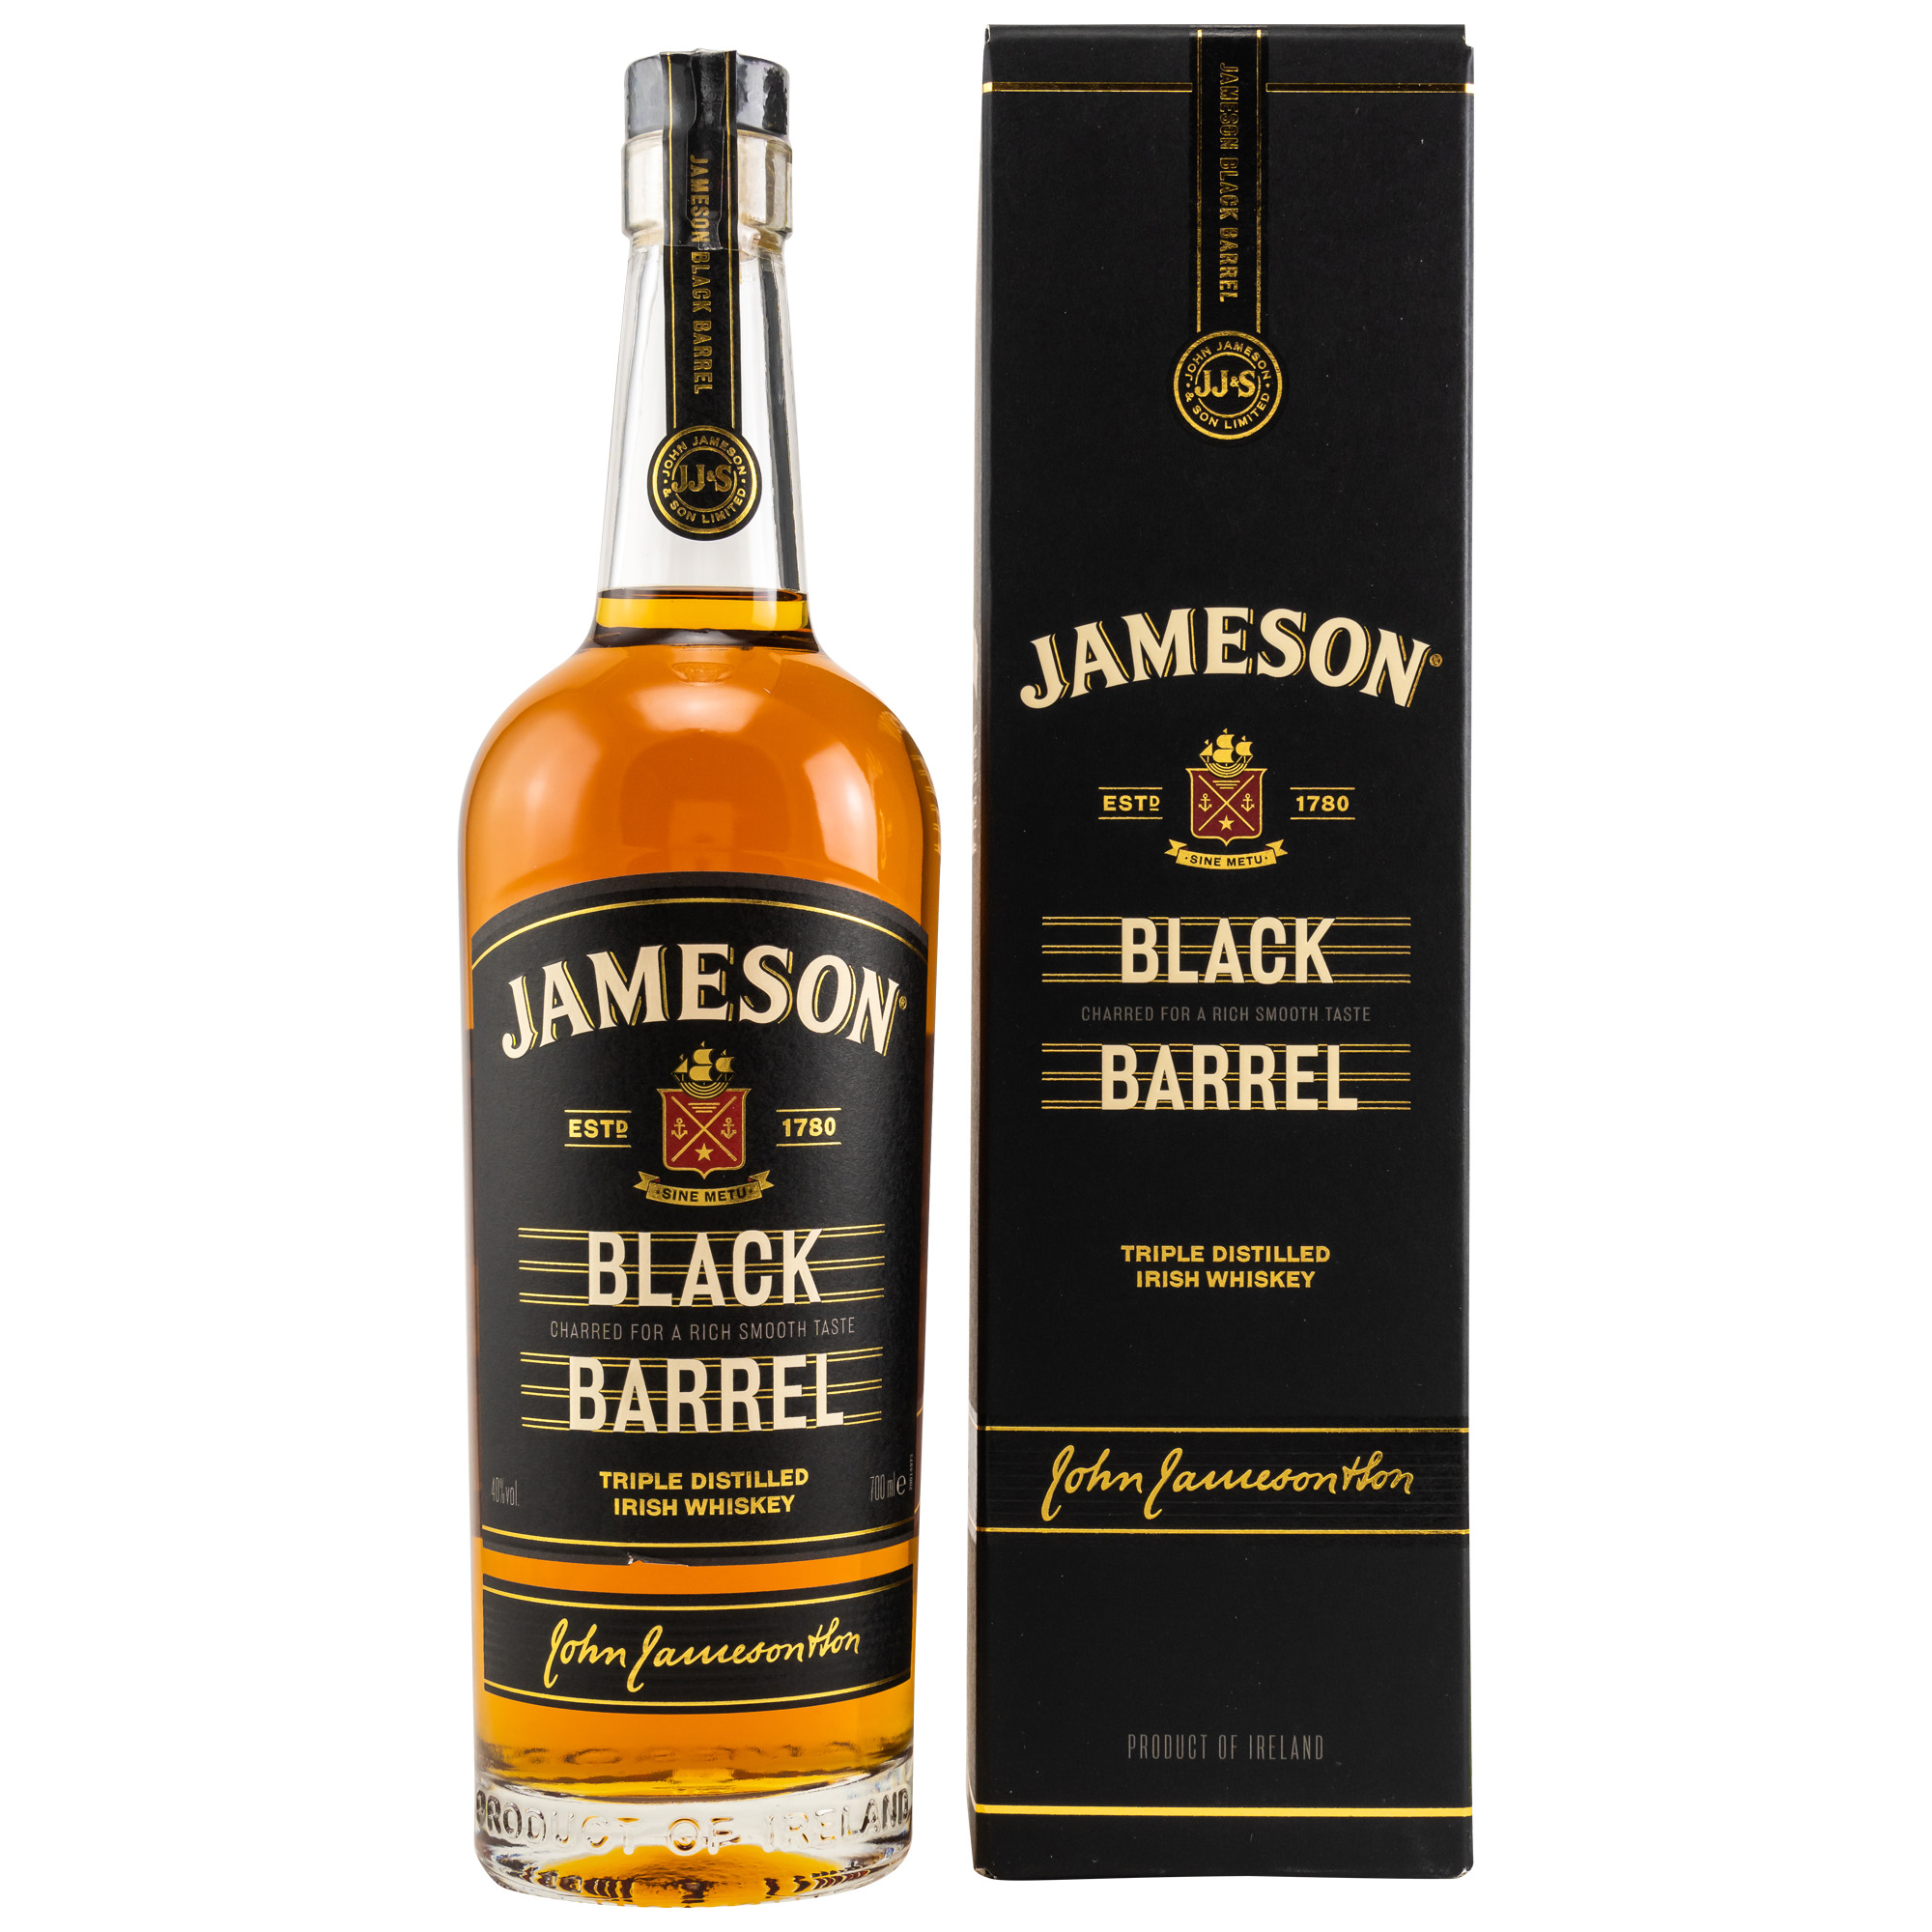 Jameson Black Barrel 40%